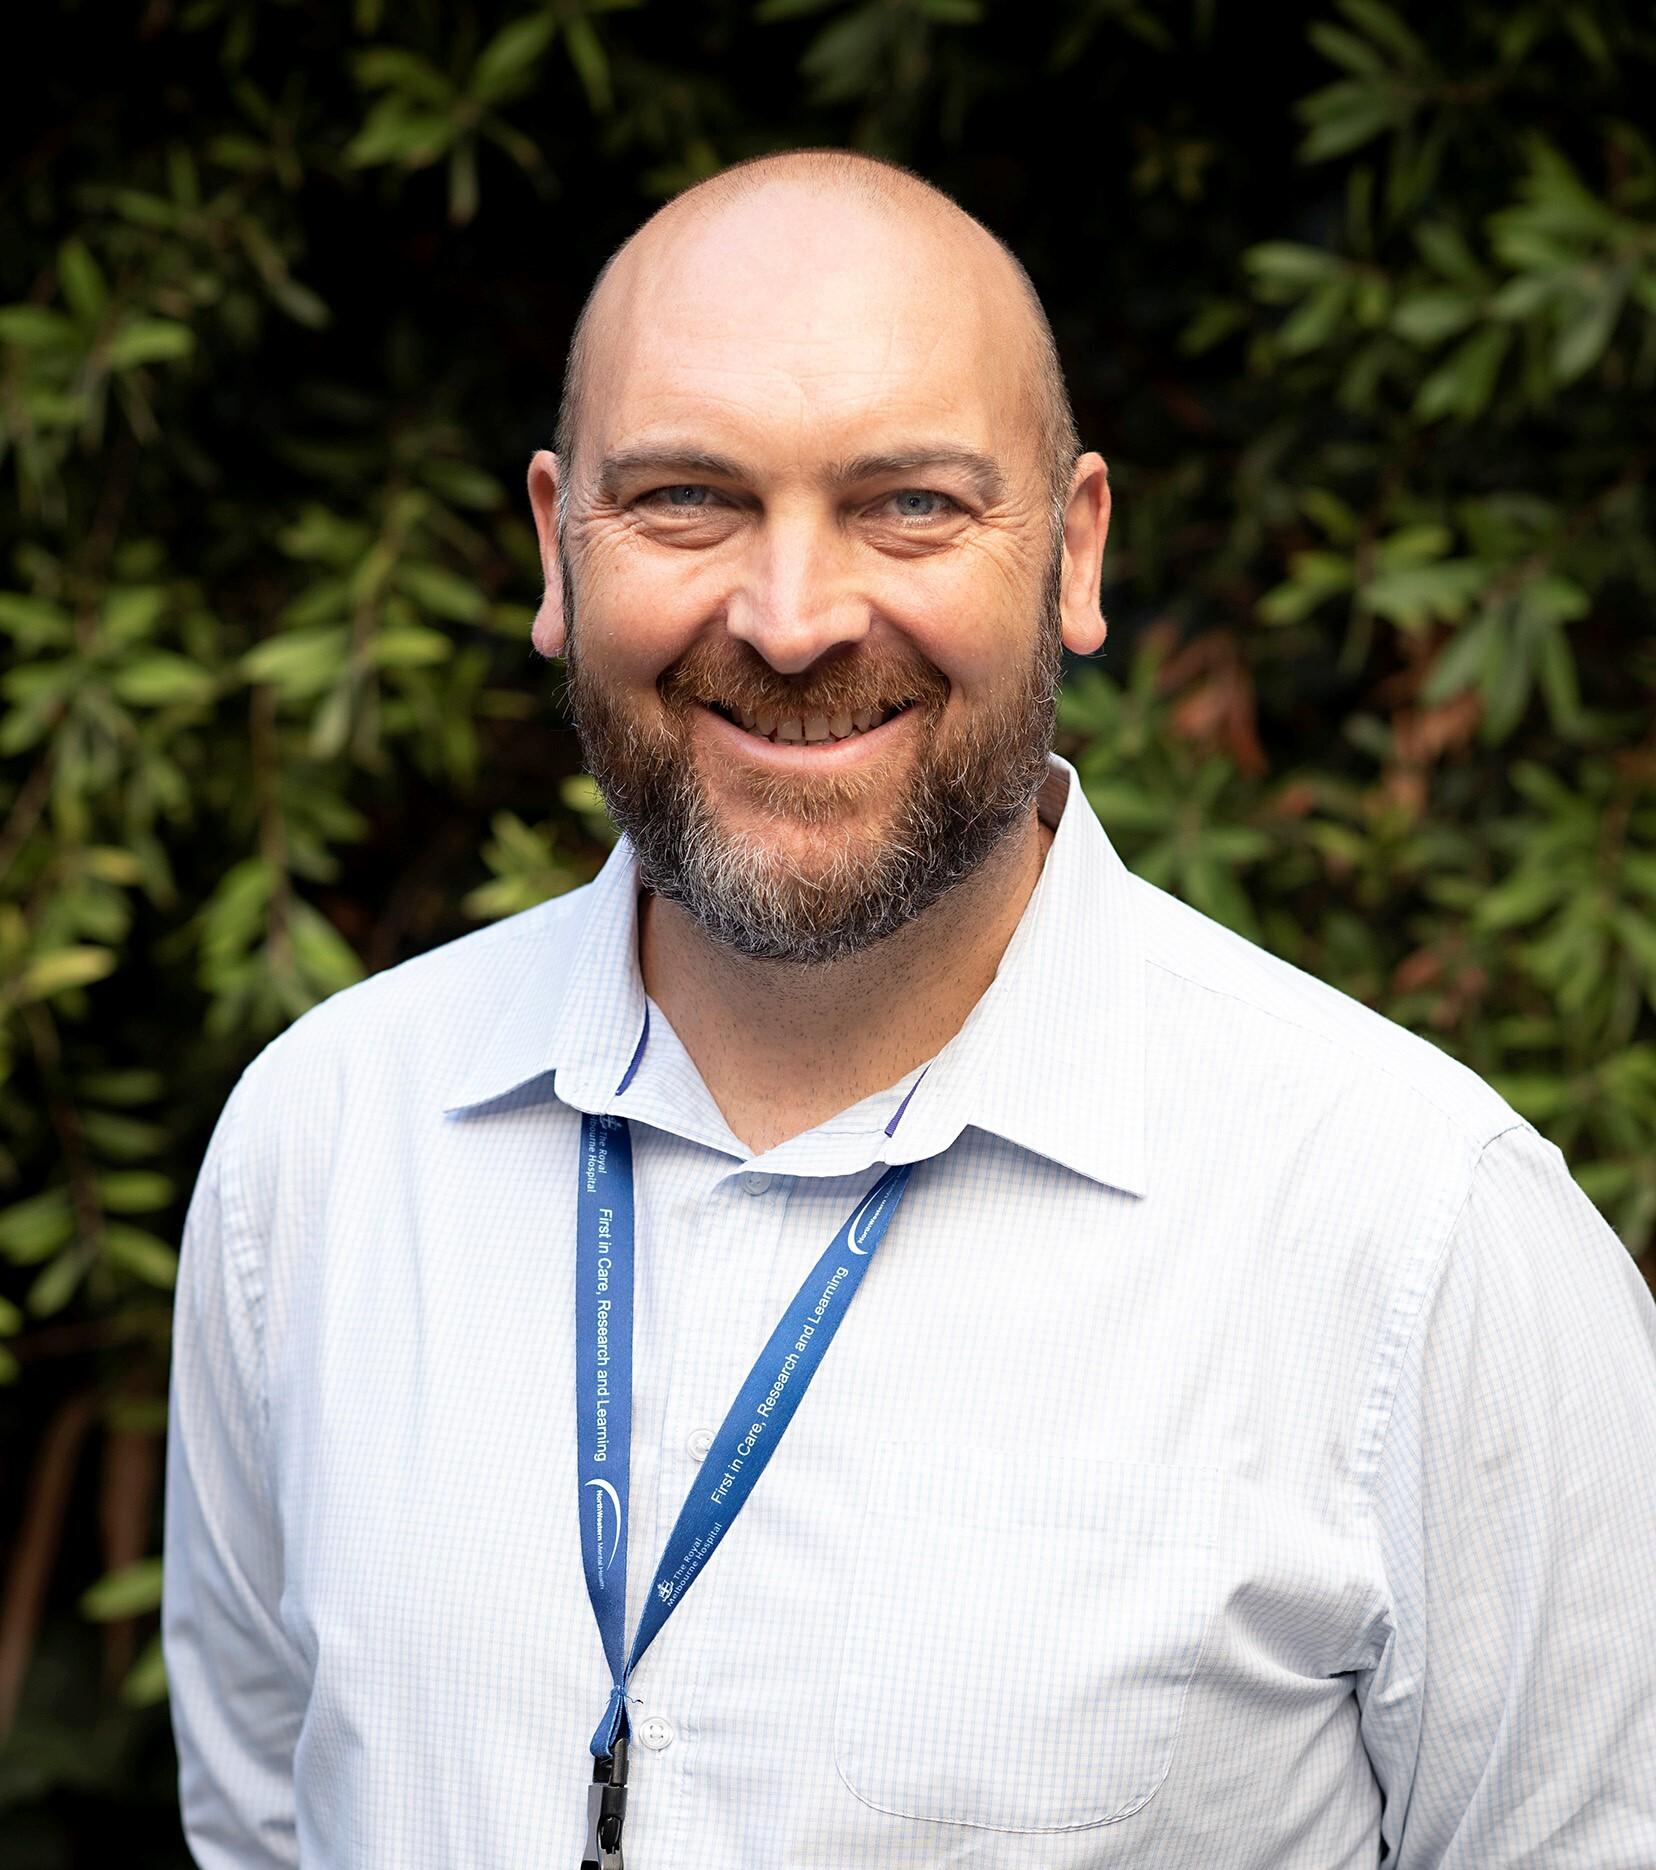 Profile picture of John Thompson